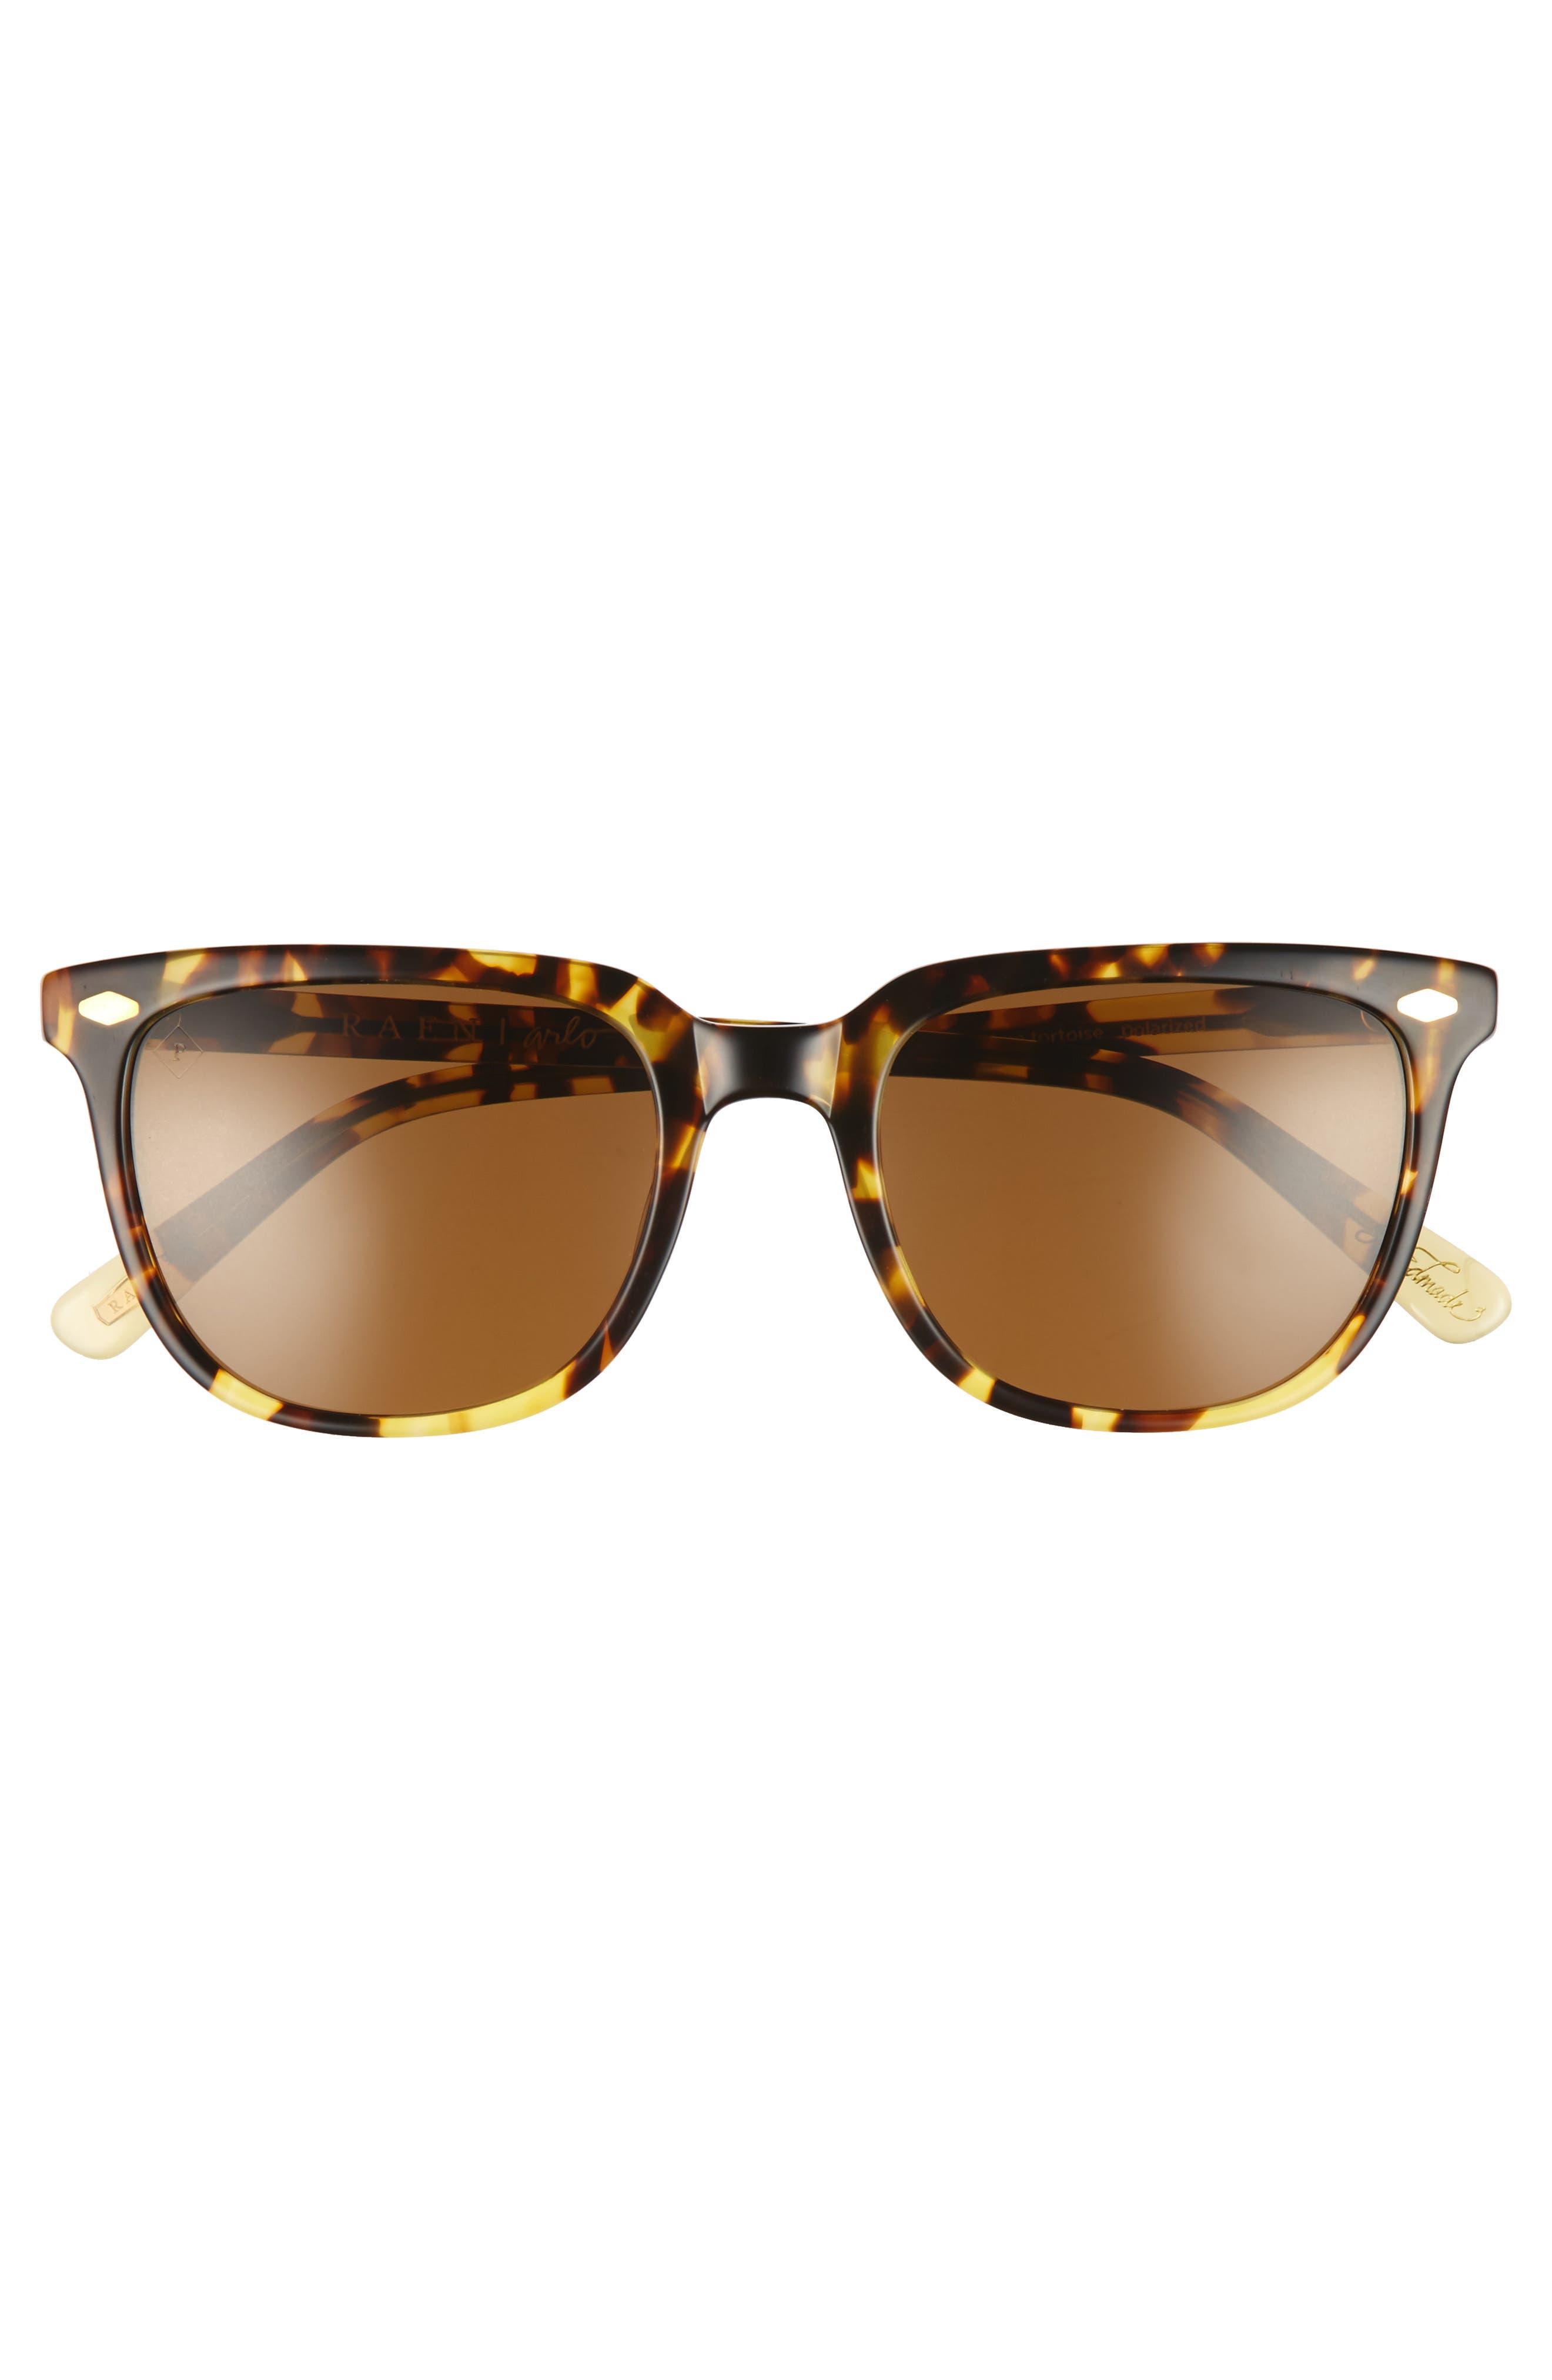 Arlo 53mm Polarized Sunglasses,                             Alternate thumbnail 2, color,                             TOKYO TORTOISE/ BROWN